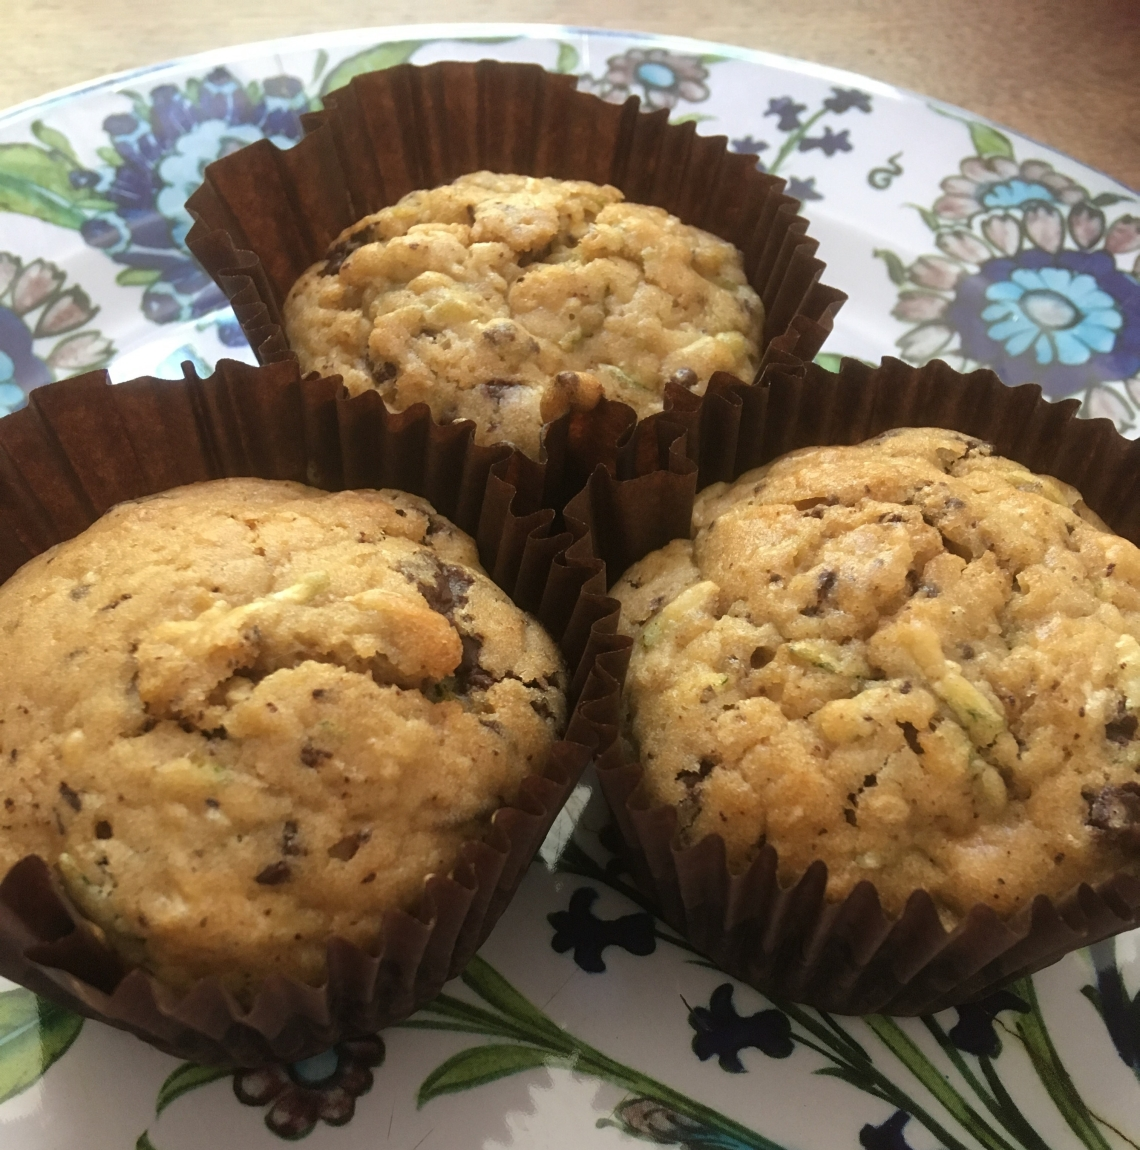 courgette-choc-chip-muffins.jpg